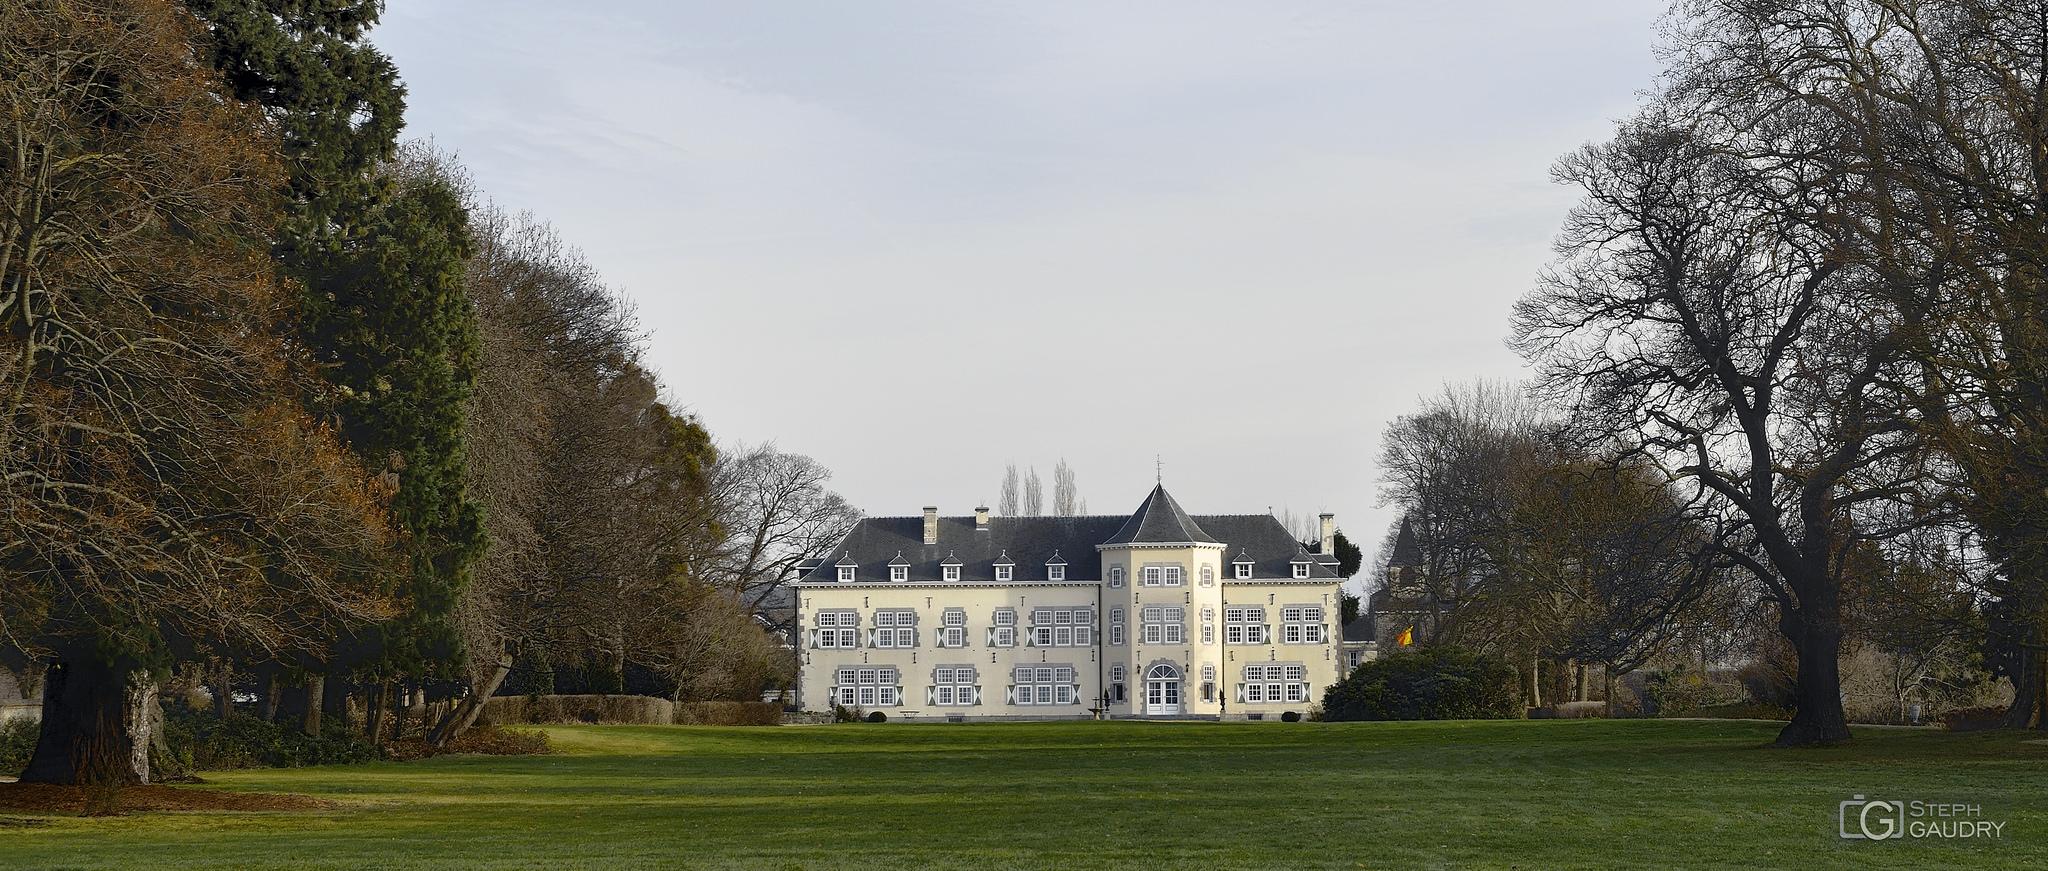 Château de madame la Baronne del Marmol [Click to start slideshow]